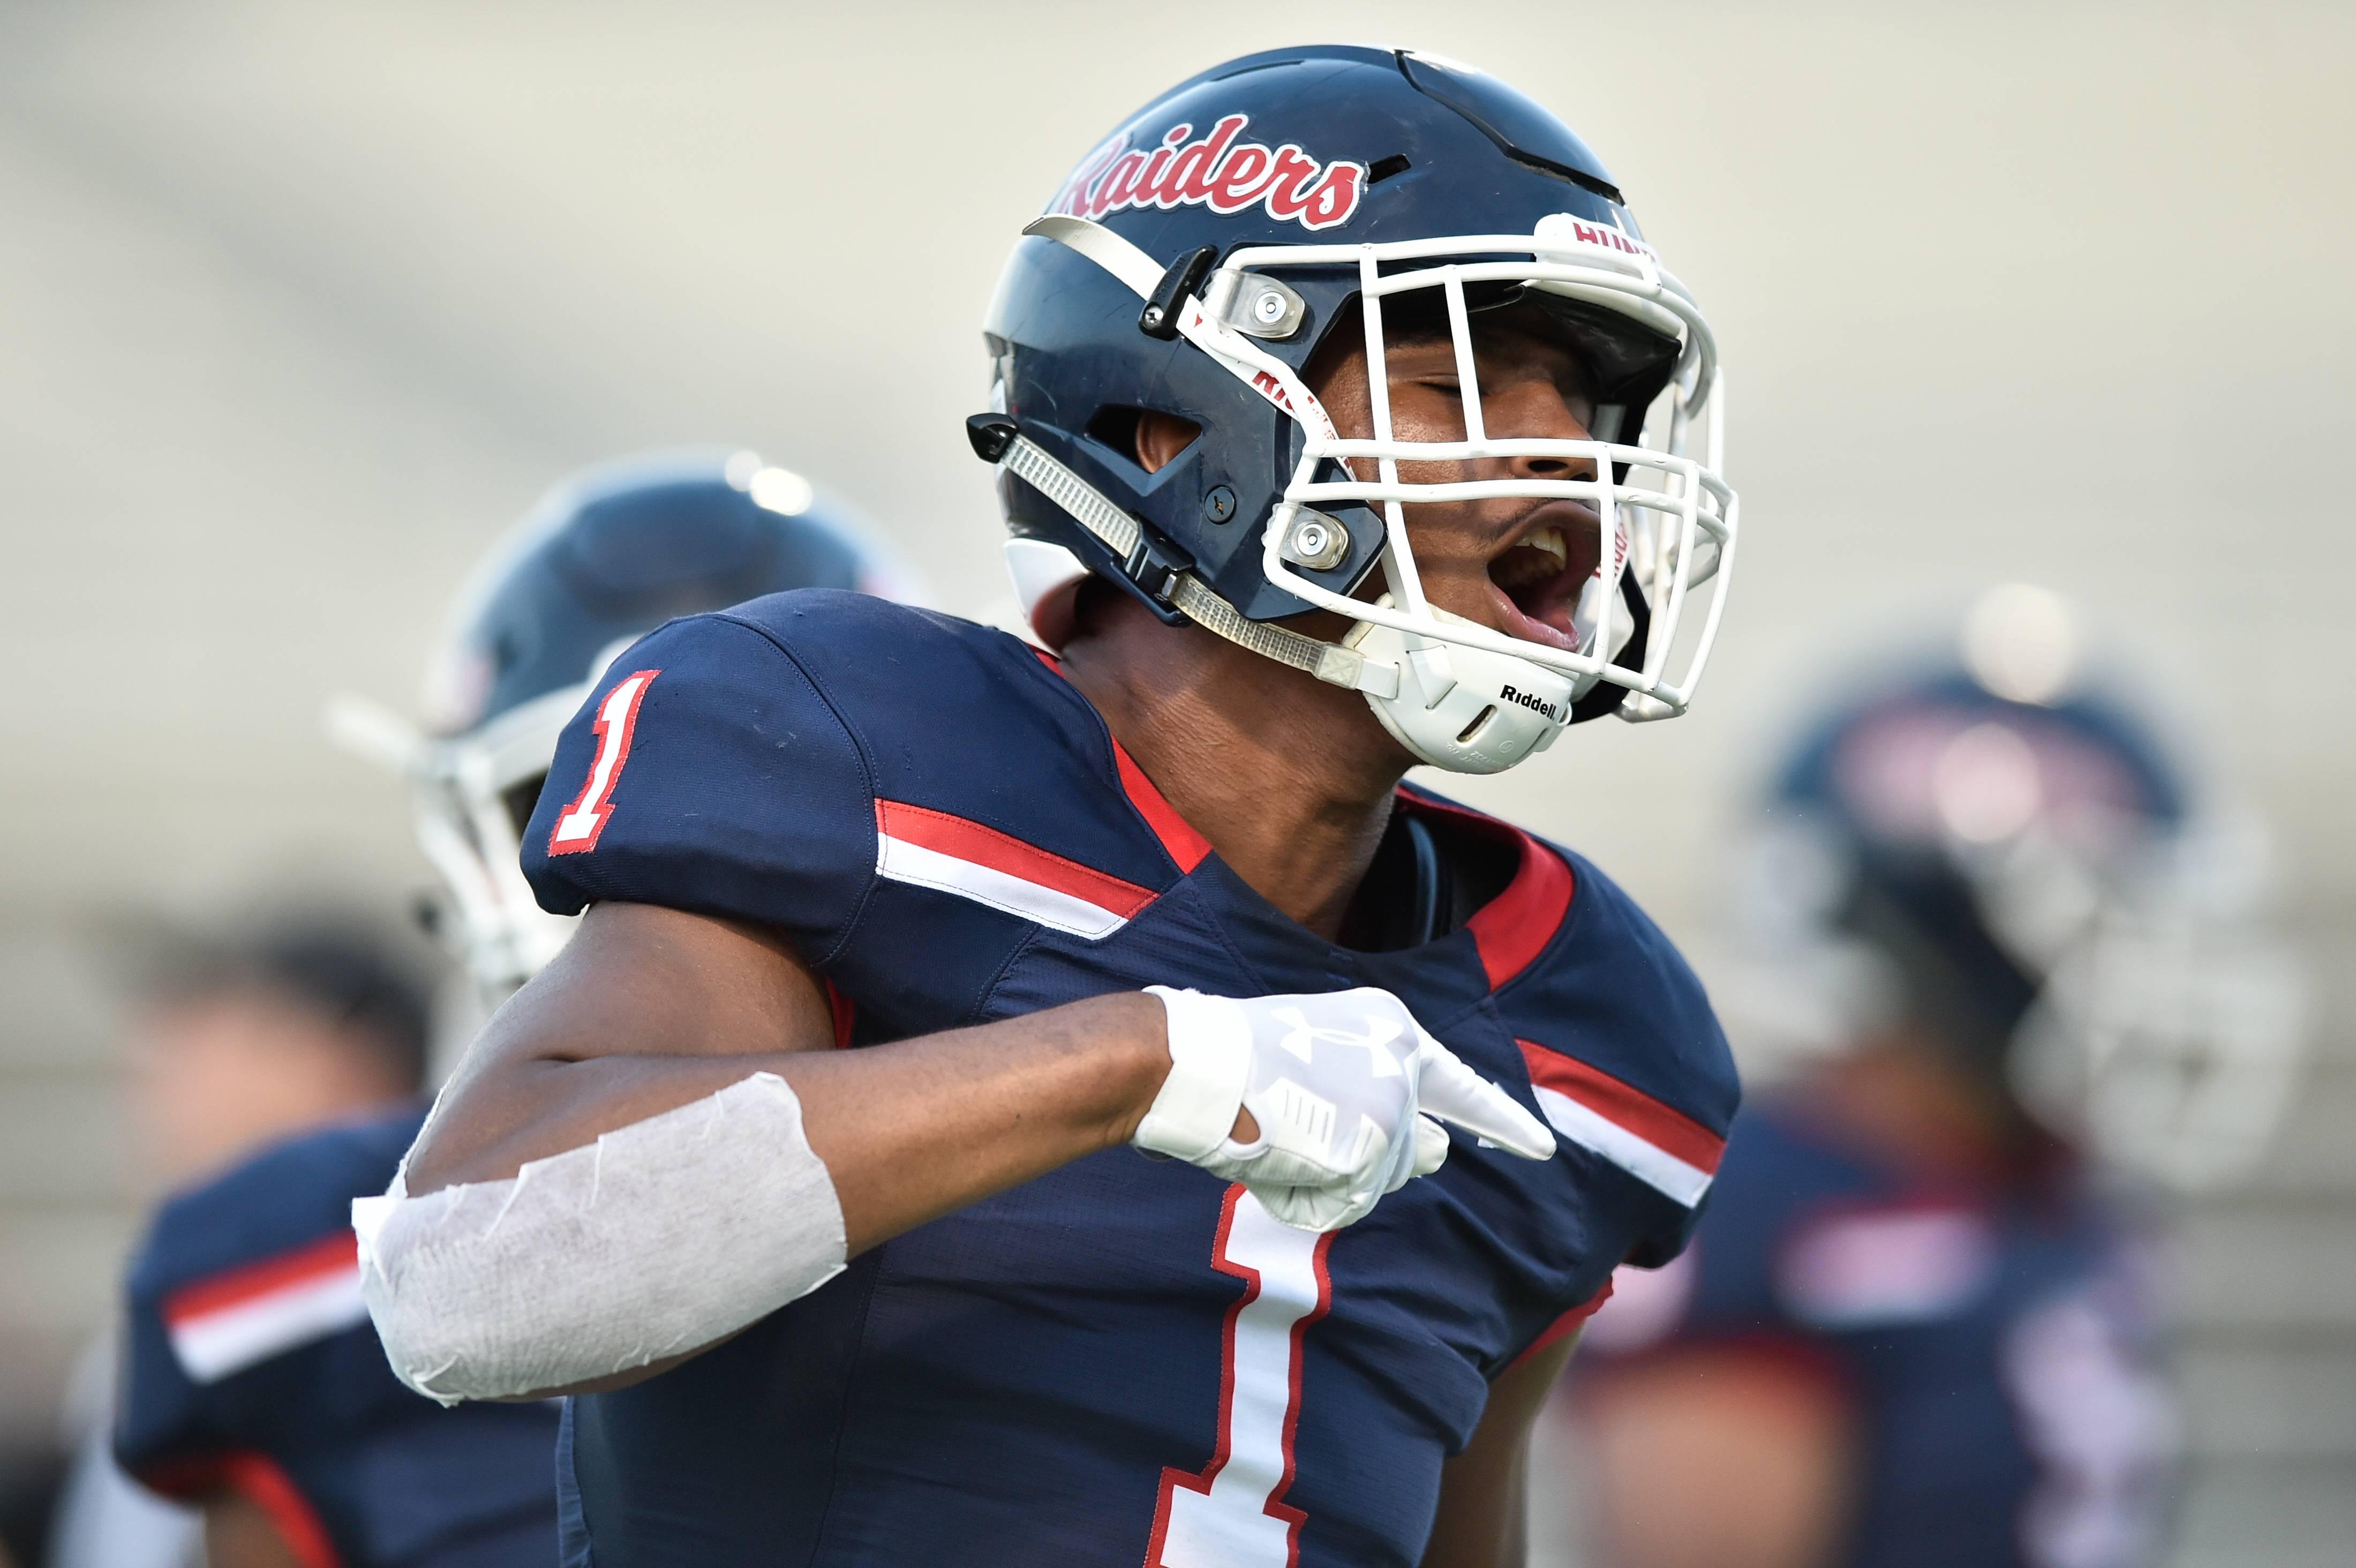 Texas adds 2021 four-star athlete Ja'Tavion Sanders to recruiting class